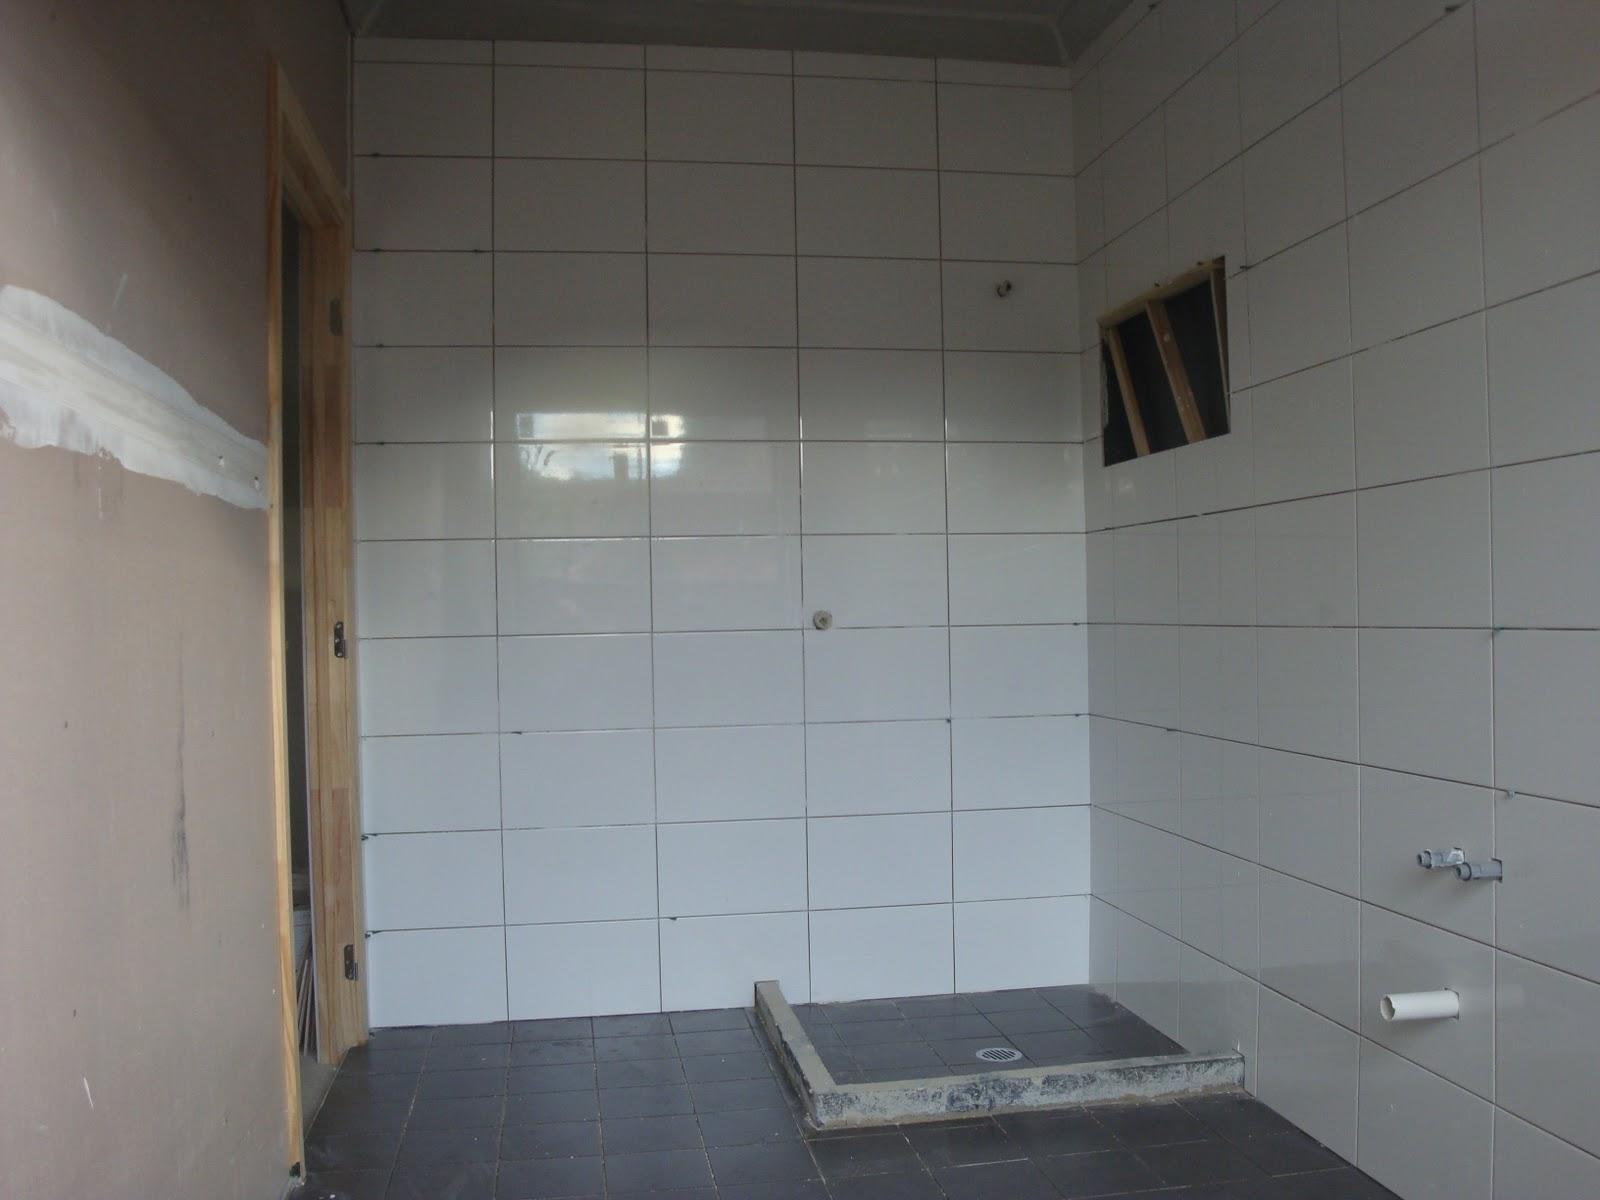 KKB Wisdom Home Sorrento 28MkII - Knockdown Rebuild: Bathroom Tiling ...